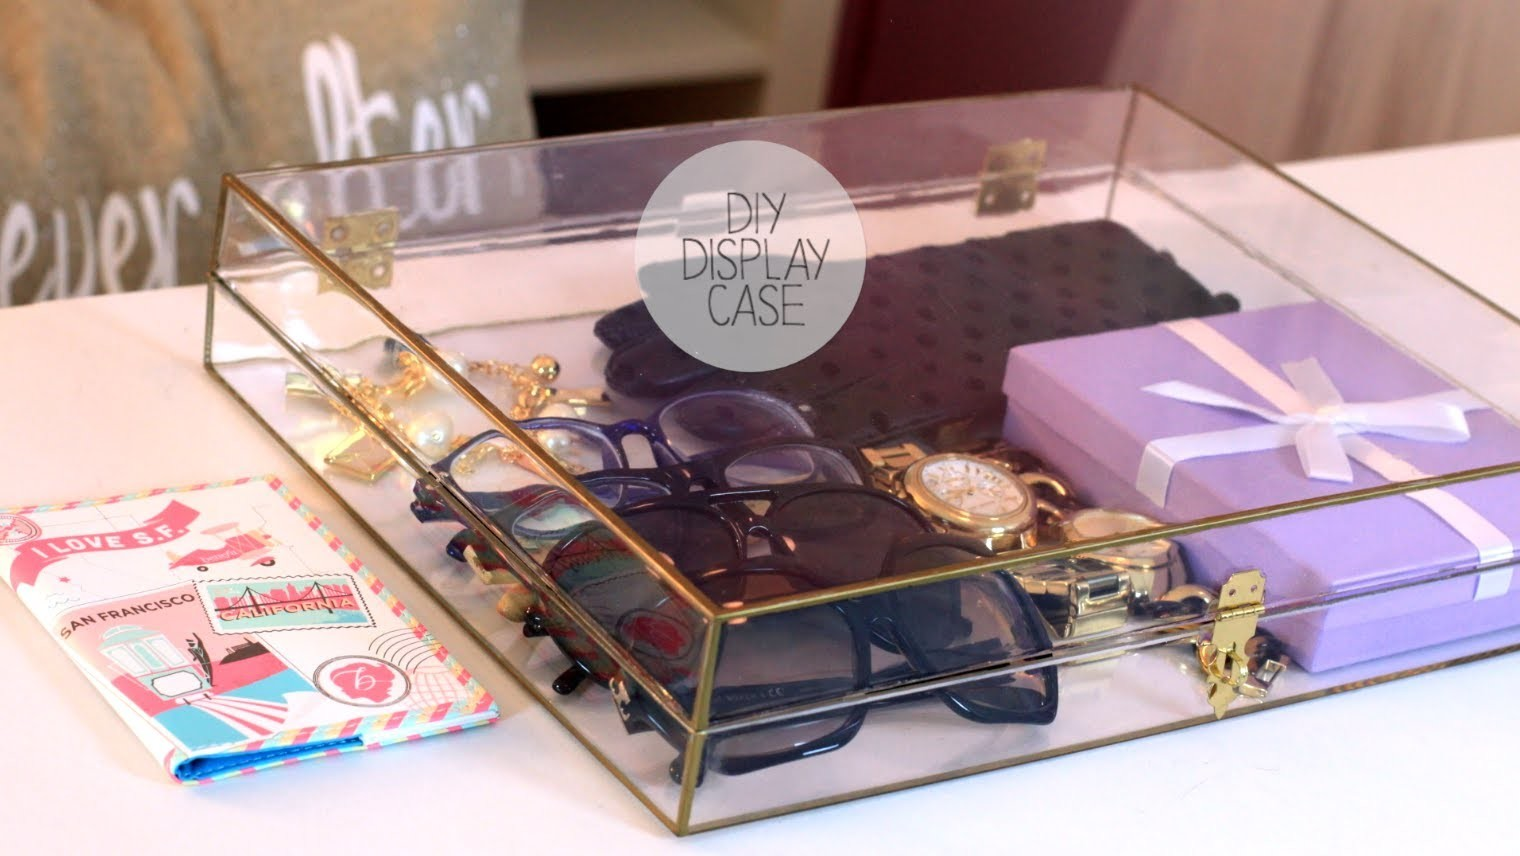 DIY Chic Display Case - Storage Decor